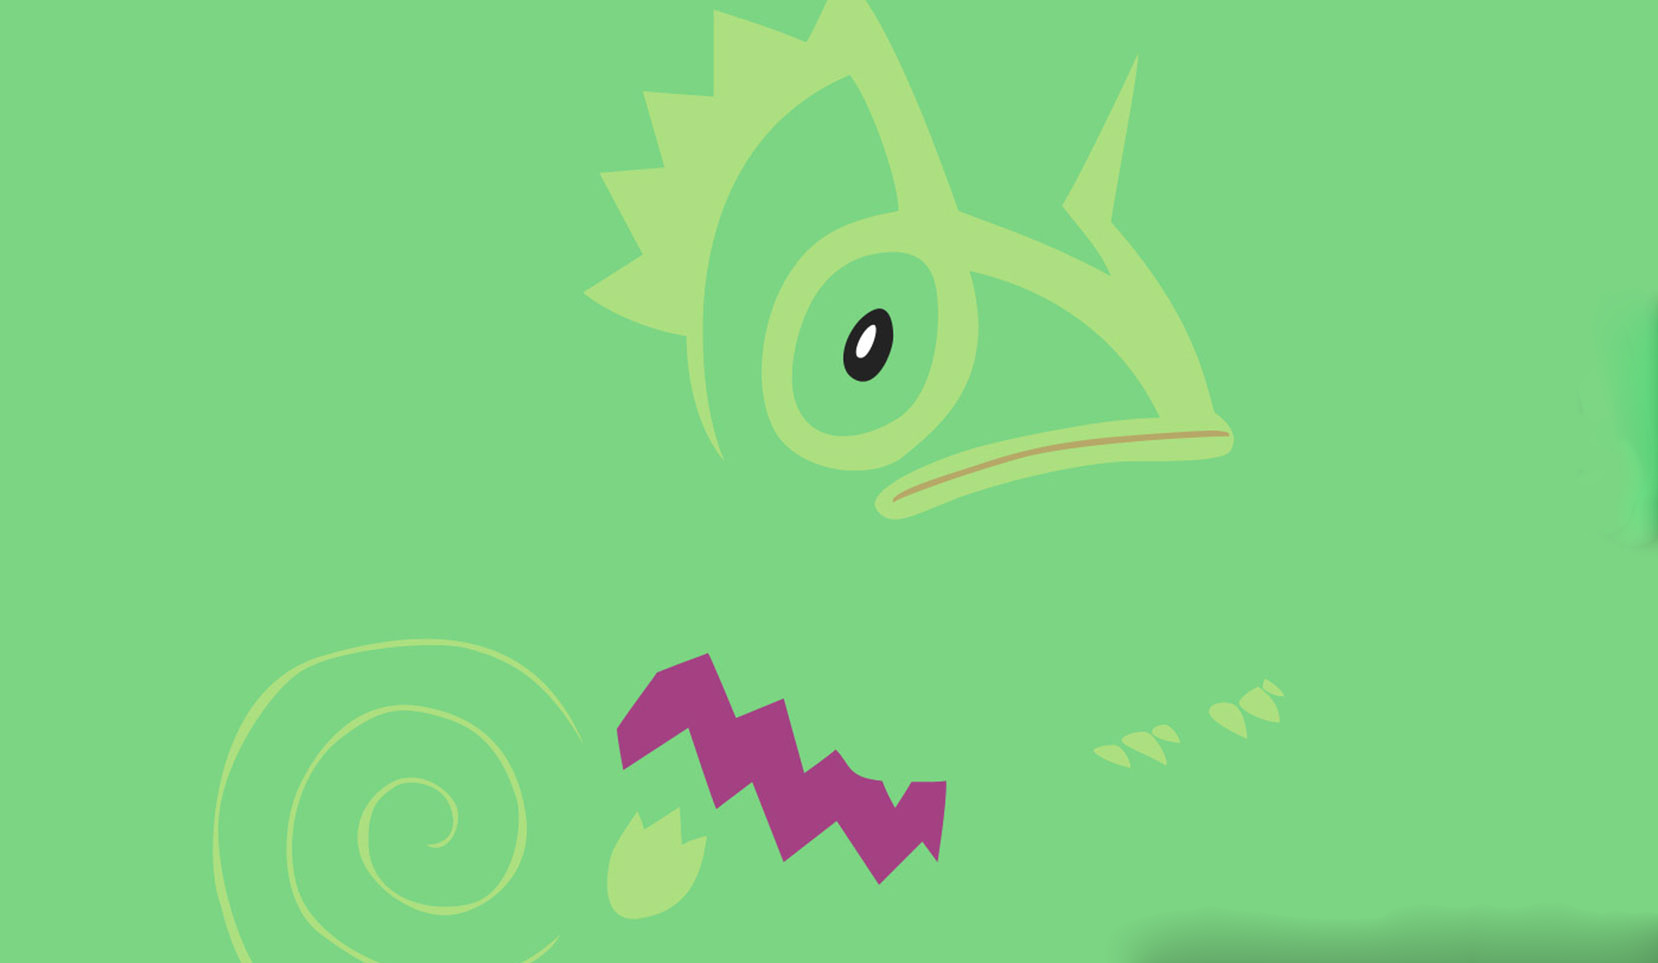 Pokemon GO雷吉洛克團戰指南:最佳打手一覽 ⋆ Pokemon Hubs 寶可夢 GO資訊